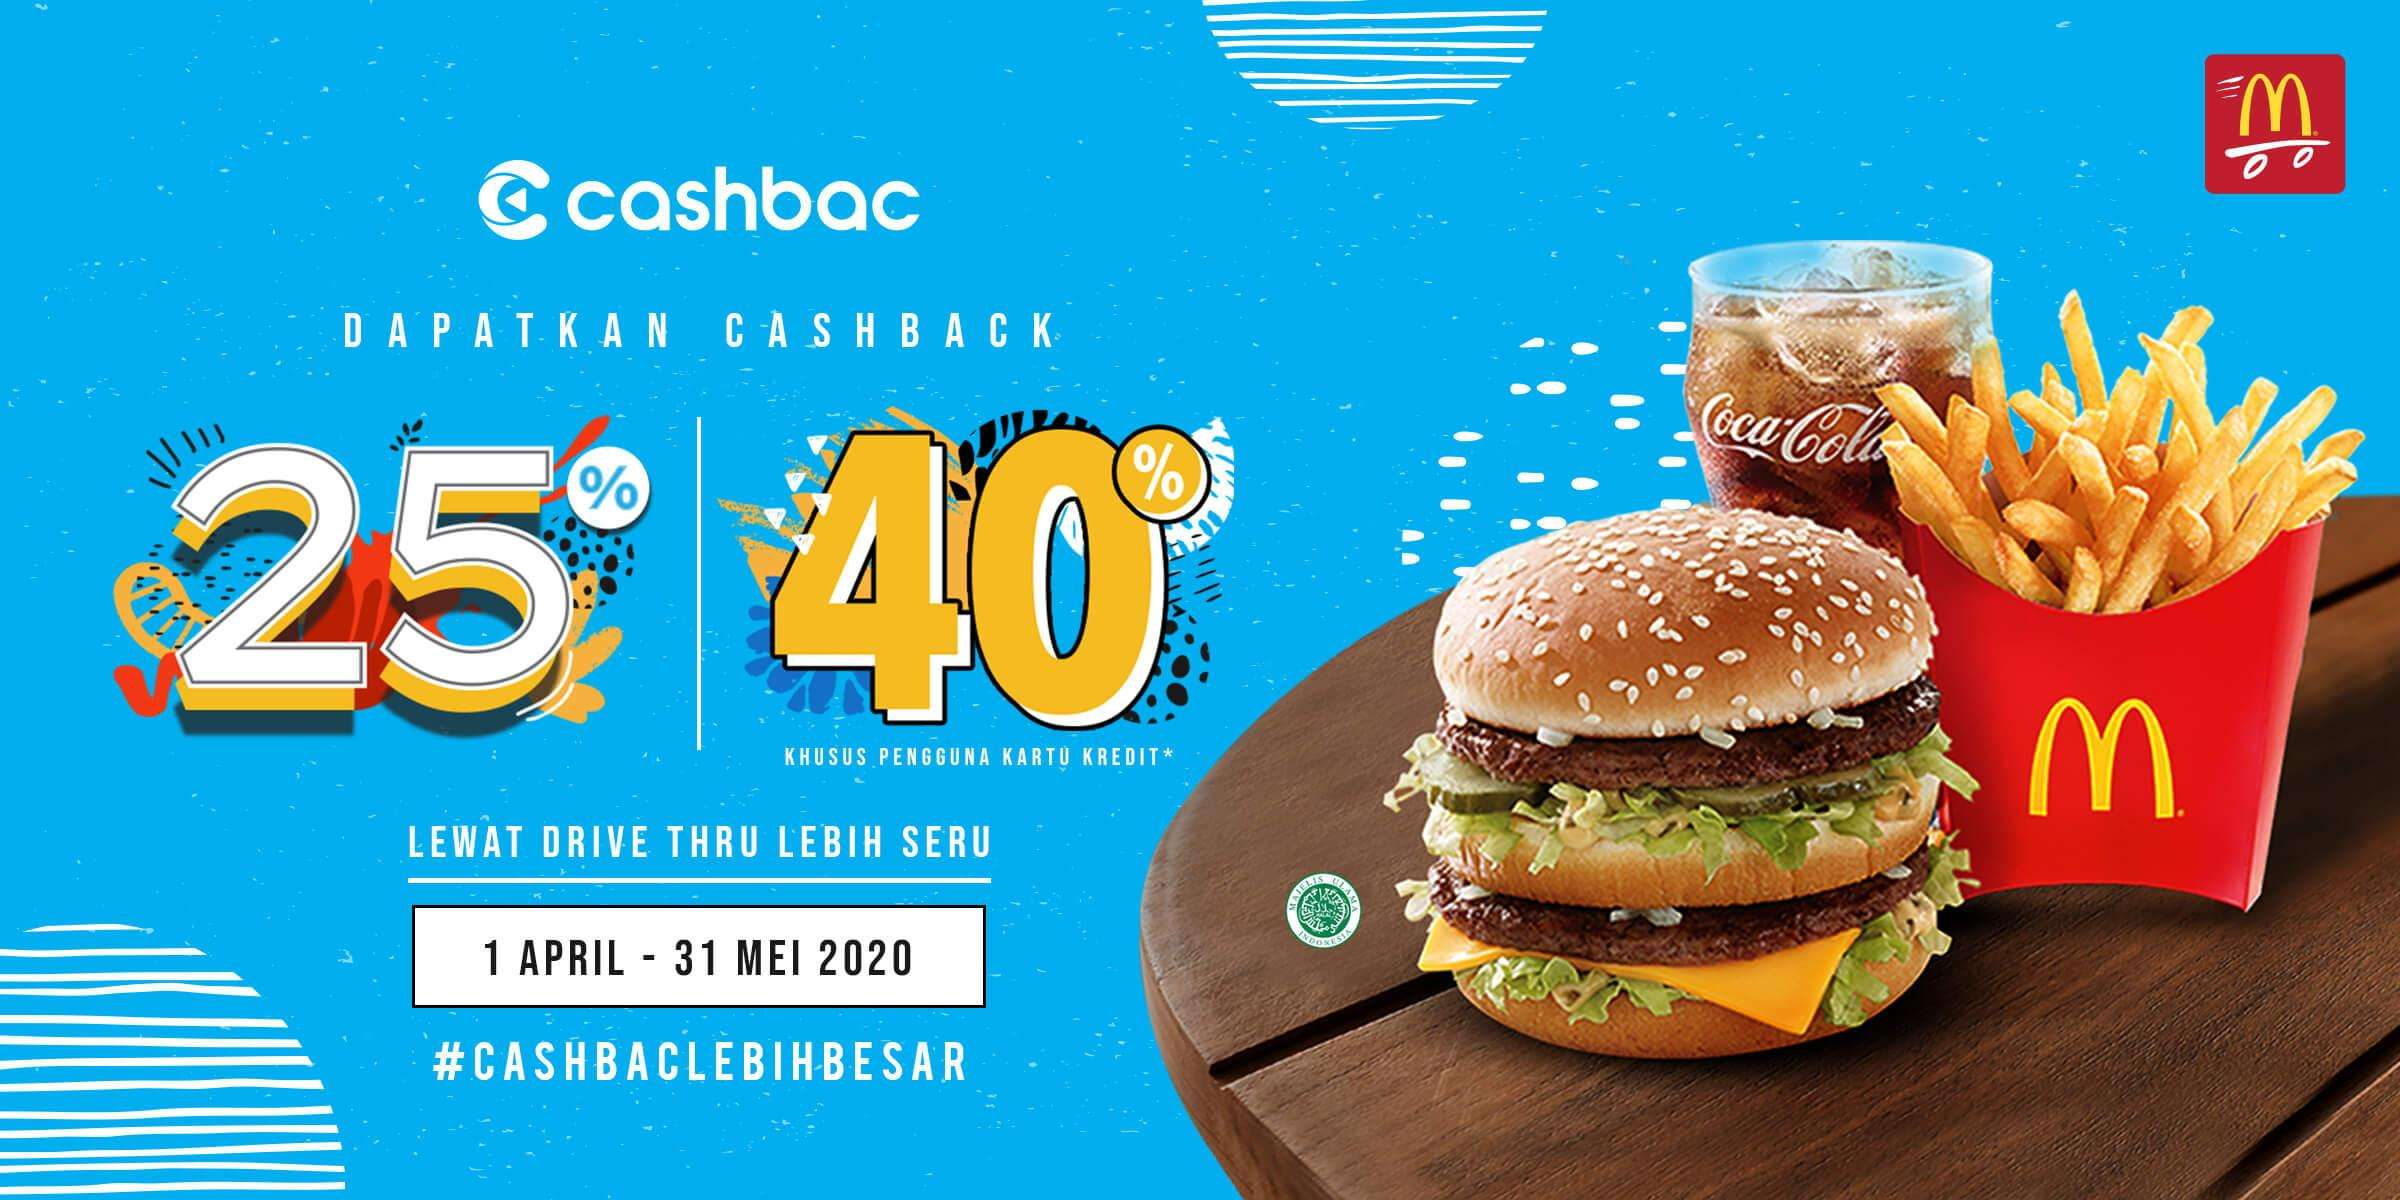 Diskon McDonalds Promo Cashback 25% & 40% Dengan Transaksi Menggunakan Cashbac App